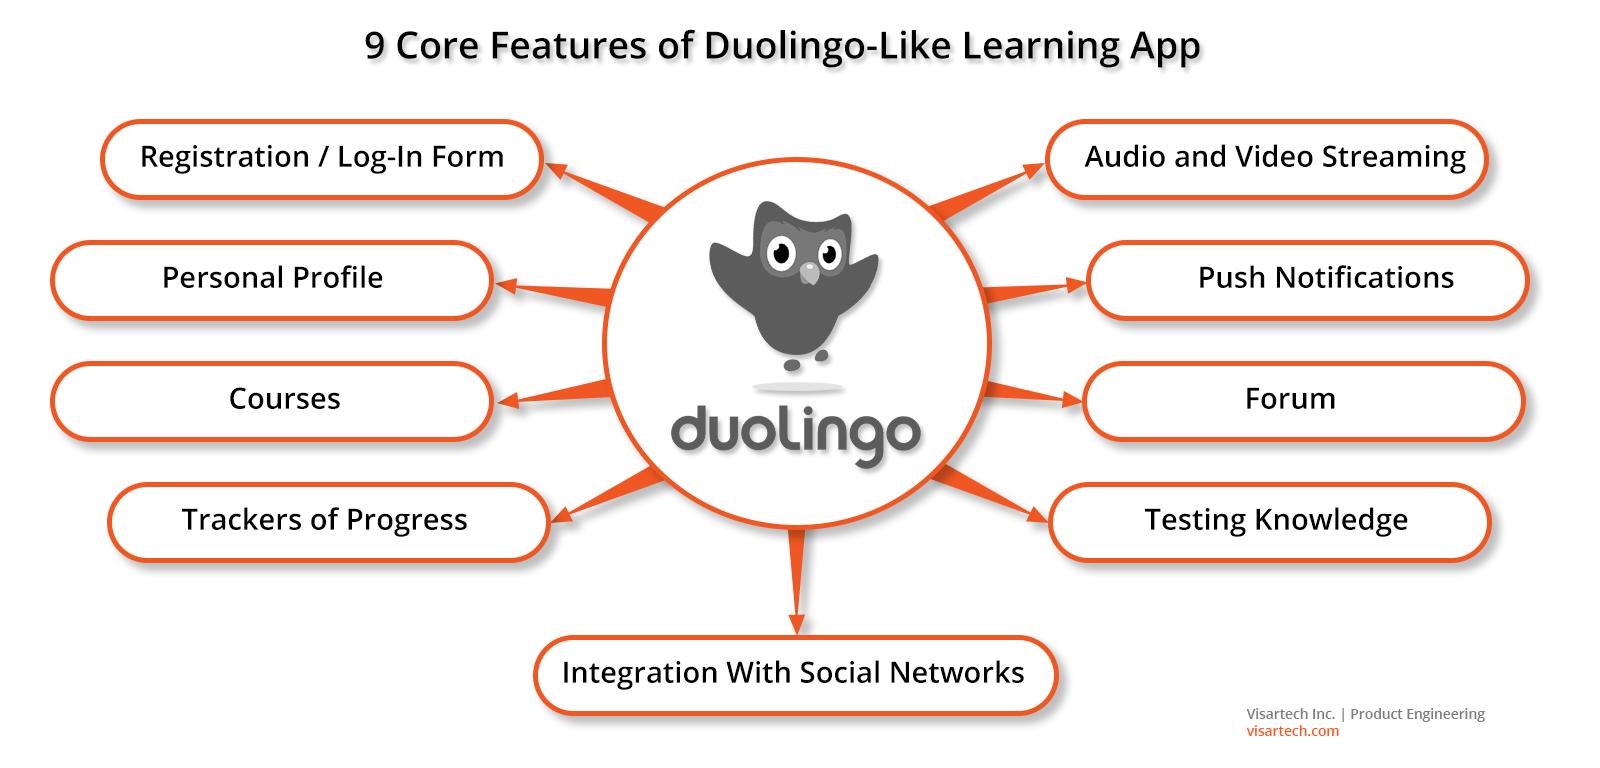 Top 9 Features of Duolingo-like Educational Apps - Visartech Blog